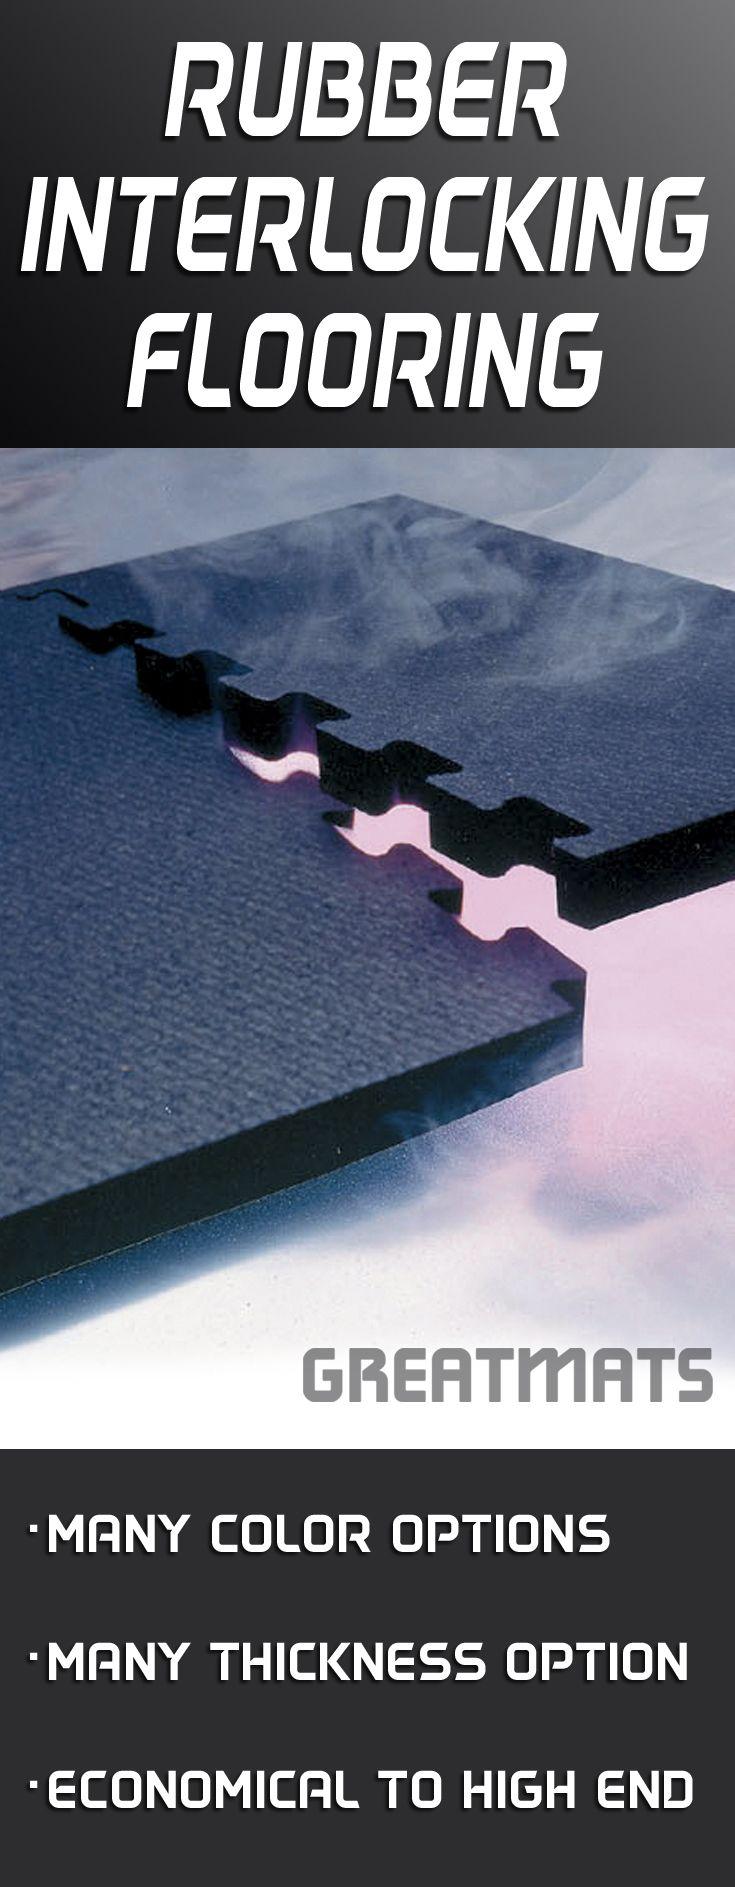 Find rubber interlocking flooring tiles of the highest